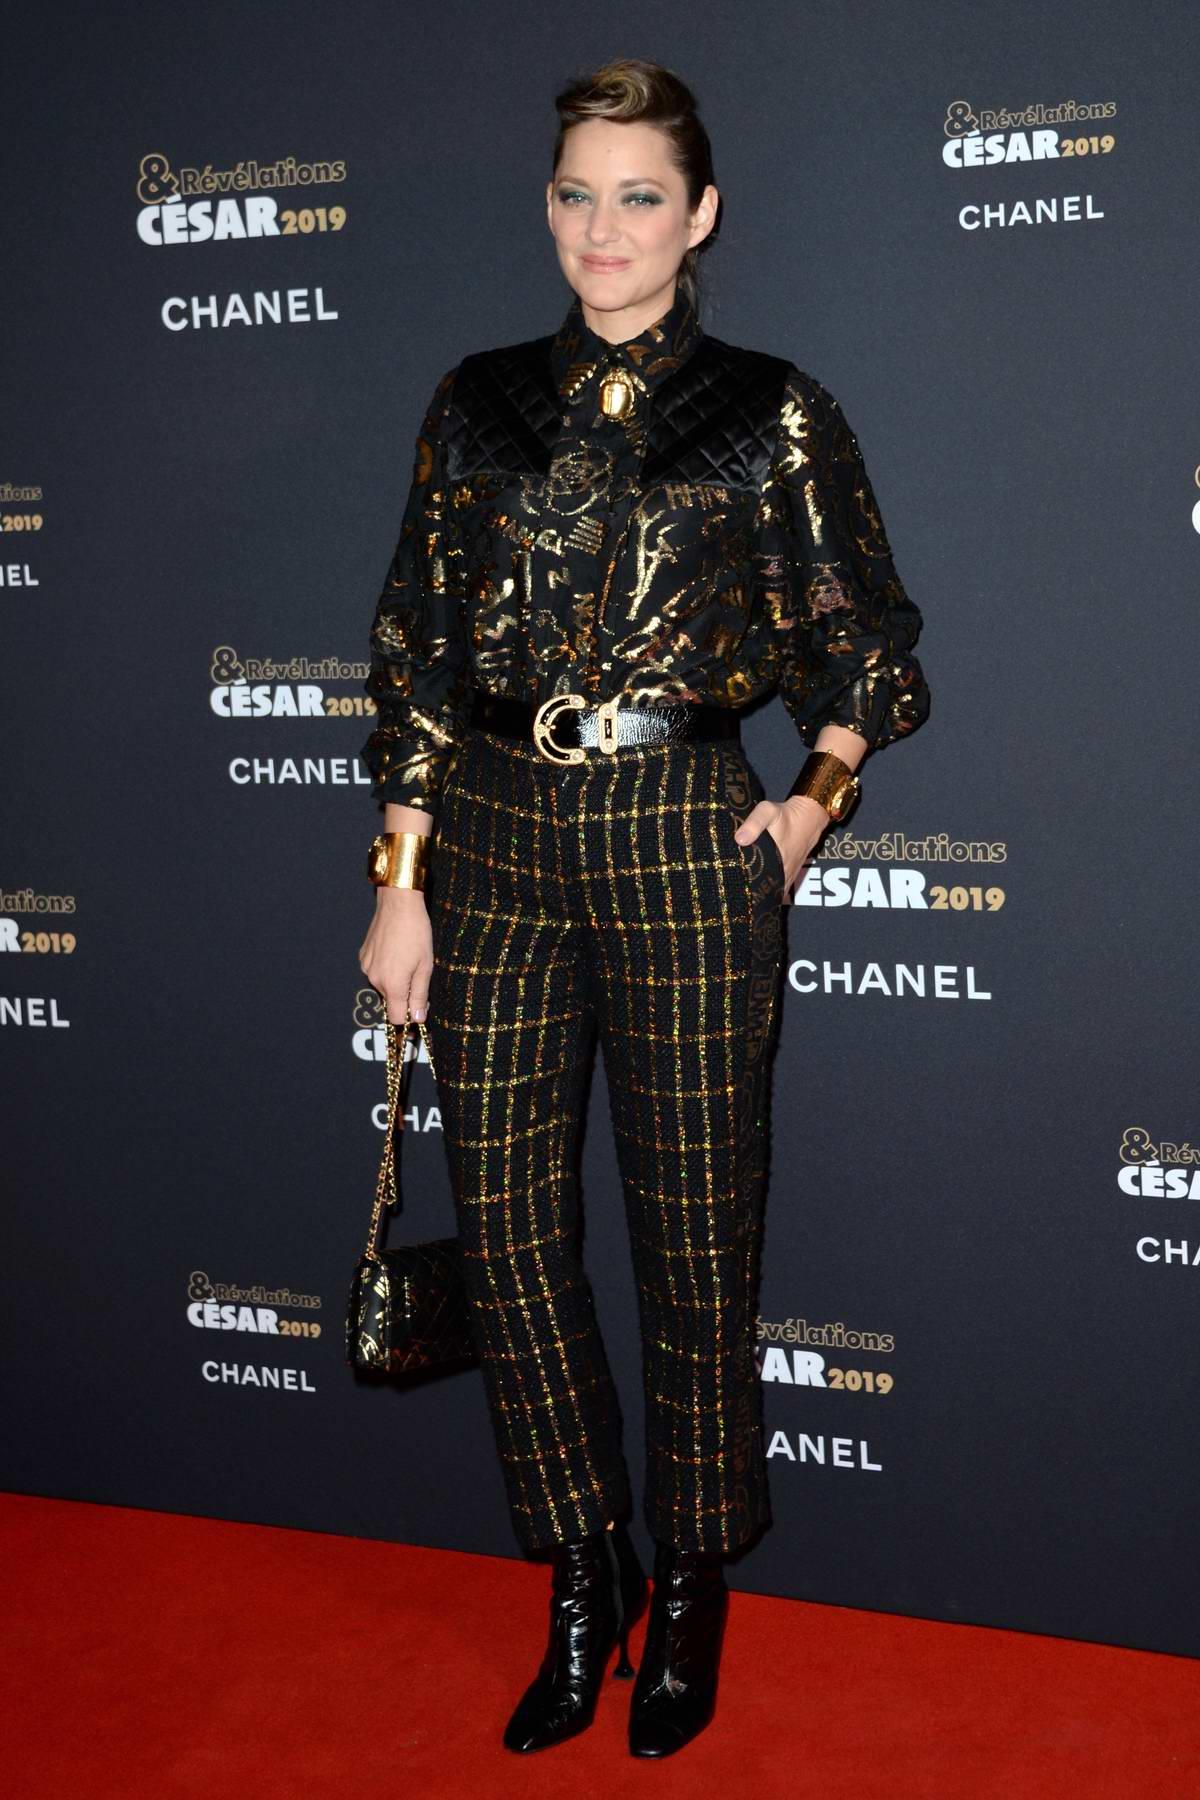 Marion Cotillard attends Cesar: Revelations 2019 at the Petit Palais in Paris, France